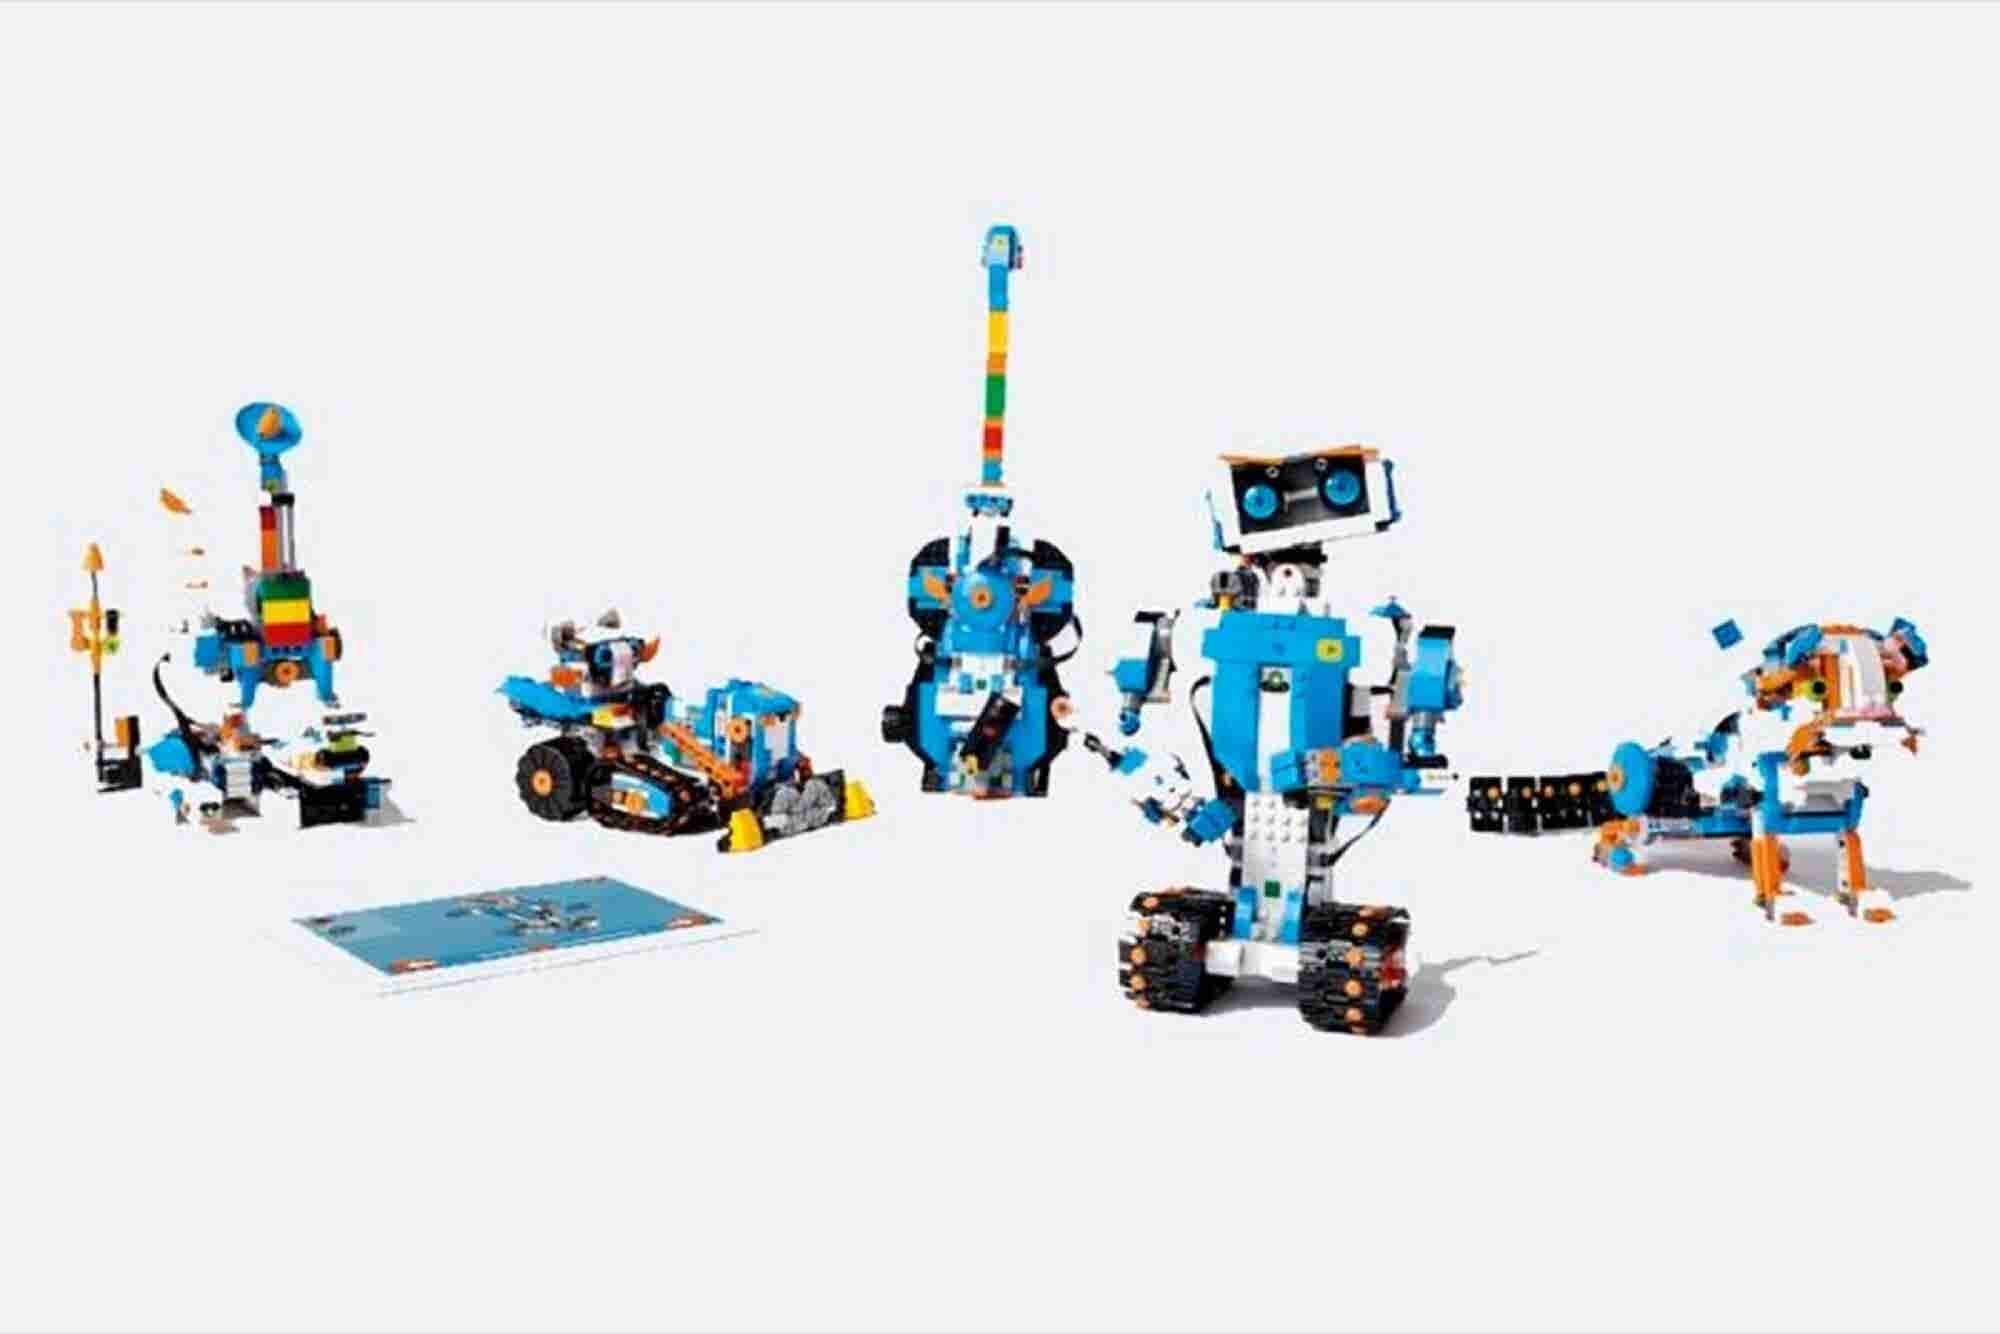 Lego's New Robotics Set Will Teach Your Child How to Code